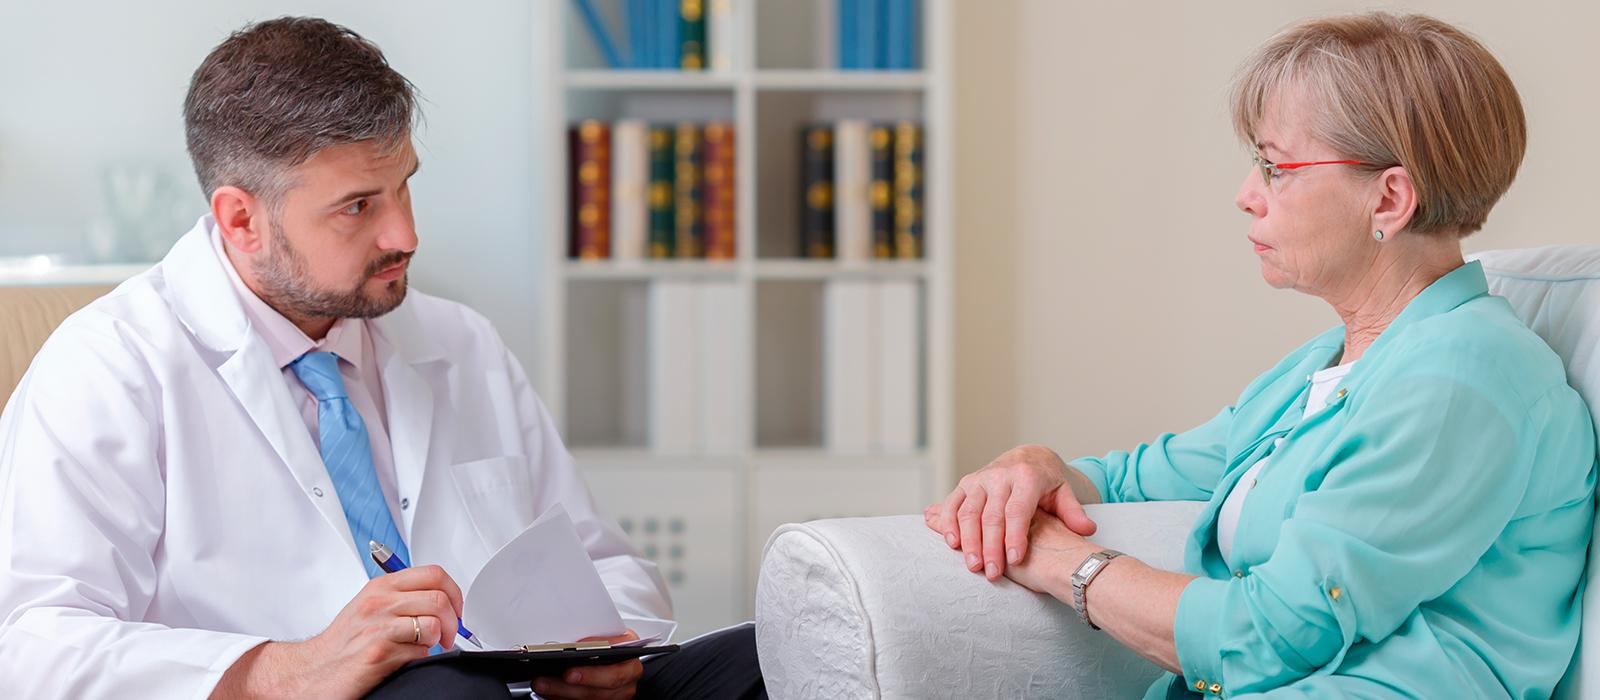 Психолог психотерапевт психиатр картинки